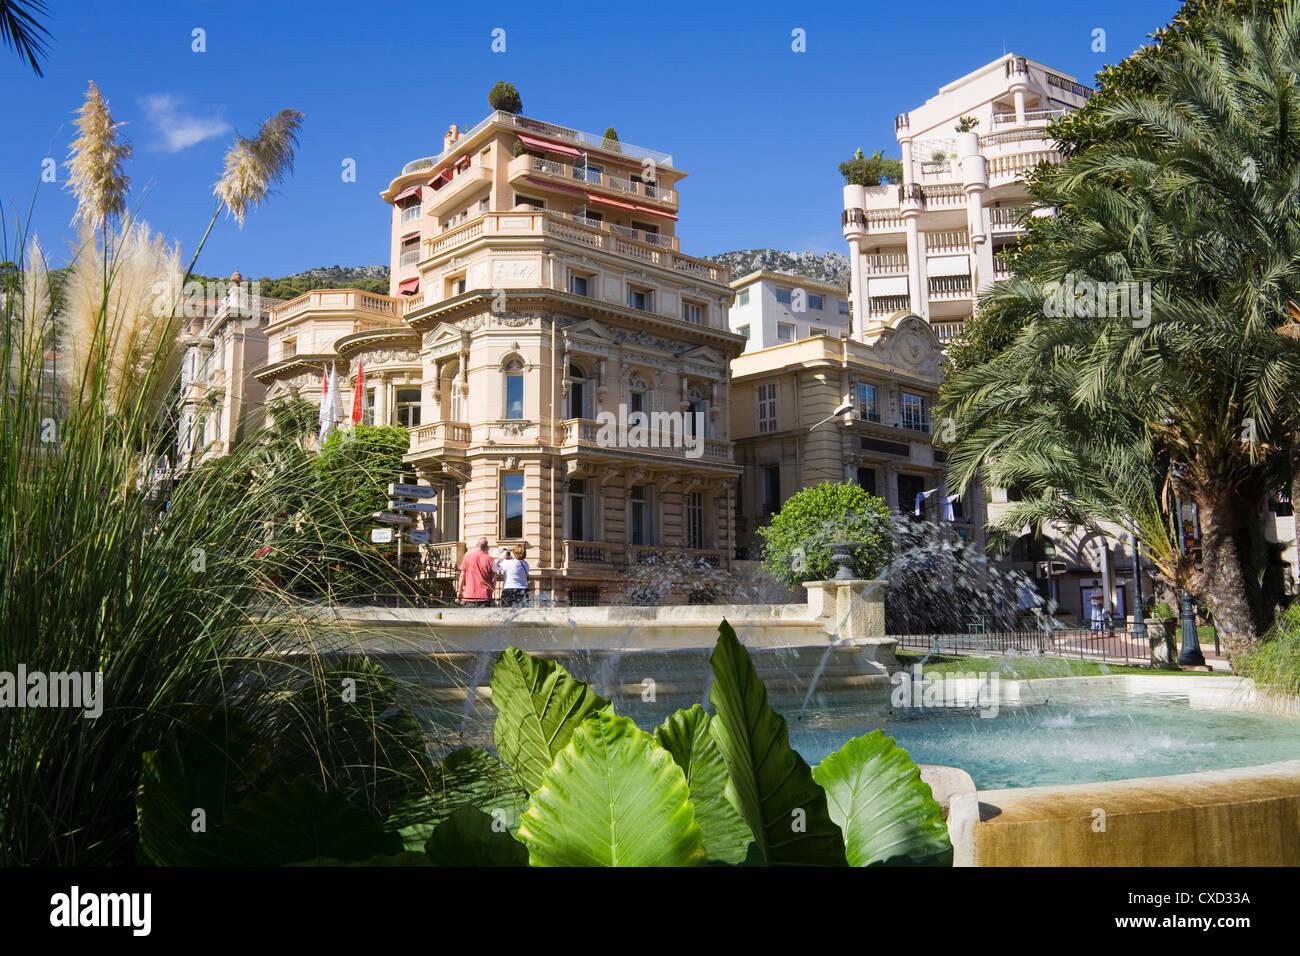 Casino Gardens, Monte Carlo, Monaco, Europe - Stock Image